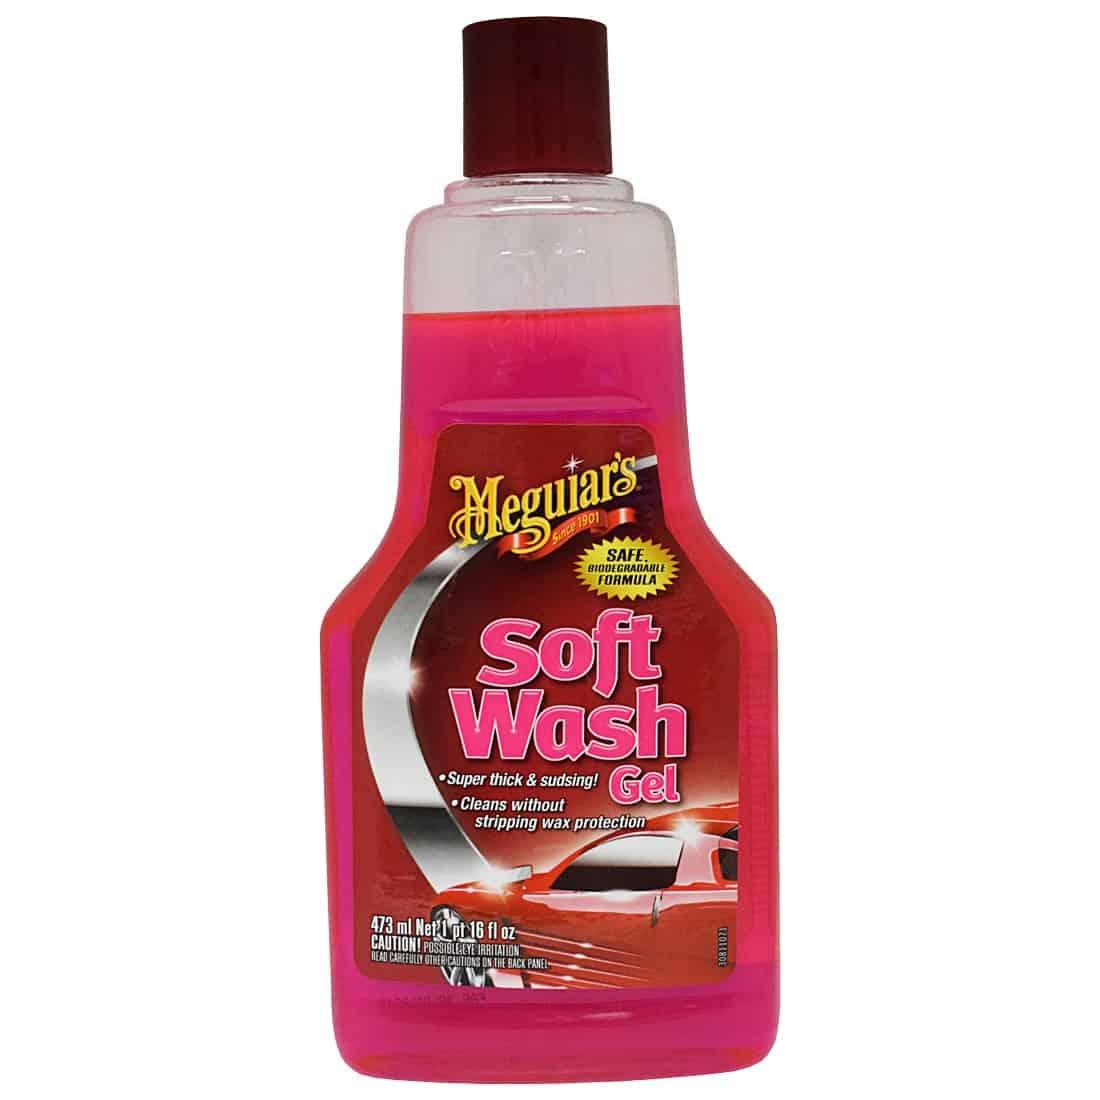 Foto 1 - Shampoo Soft Wash Meguiars - 473ml